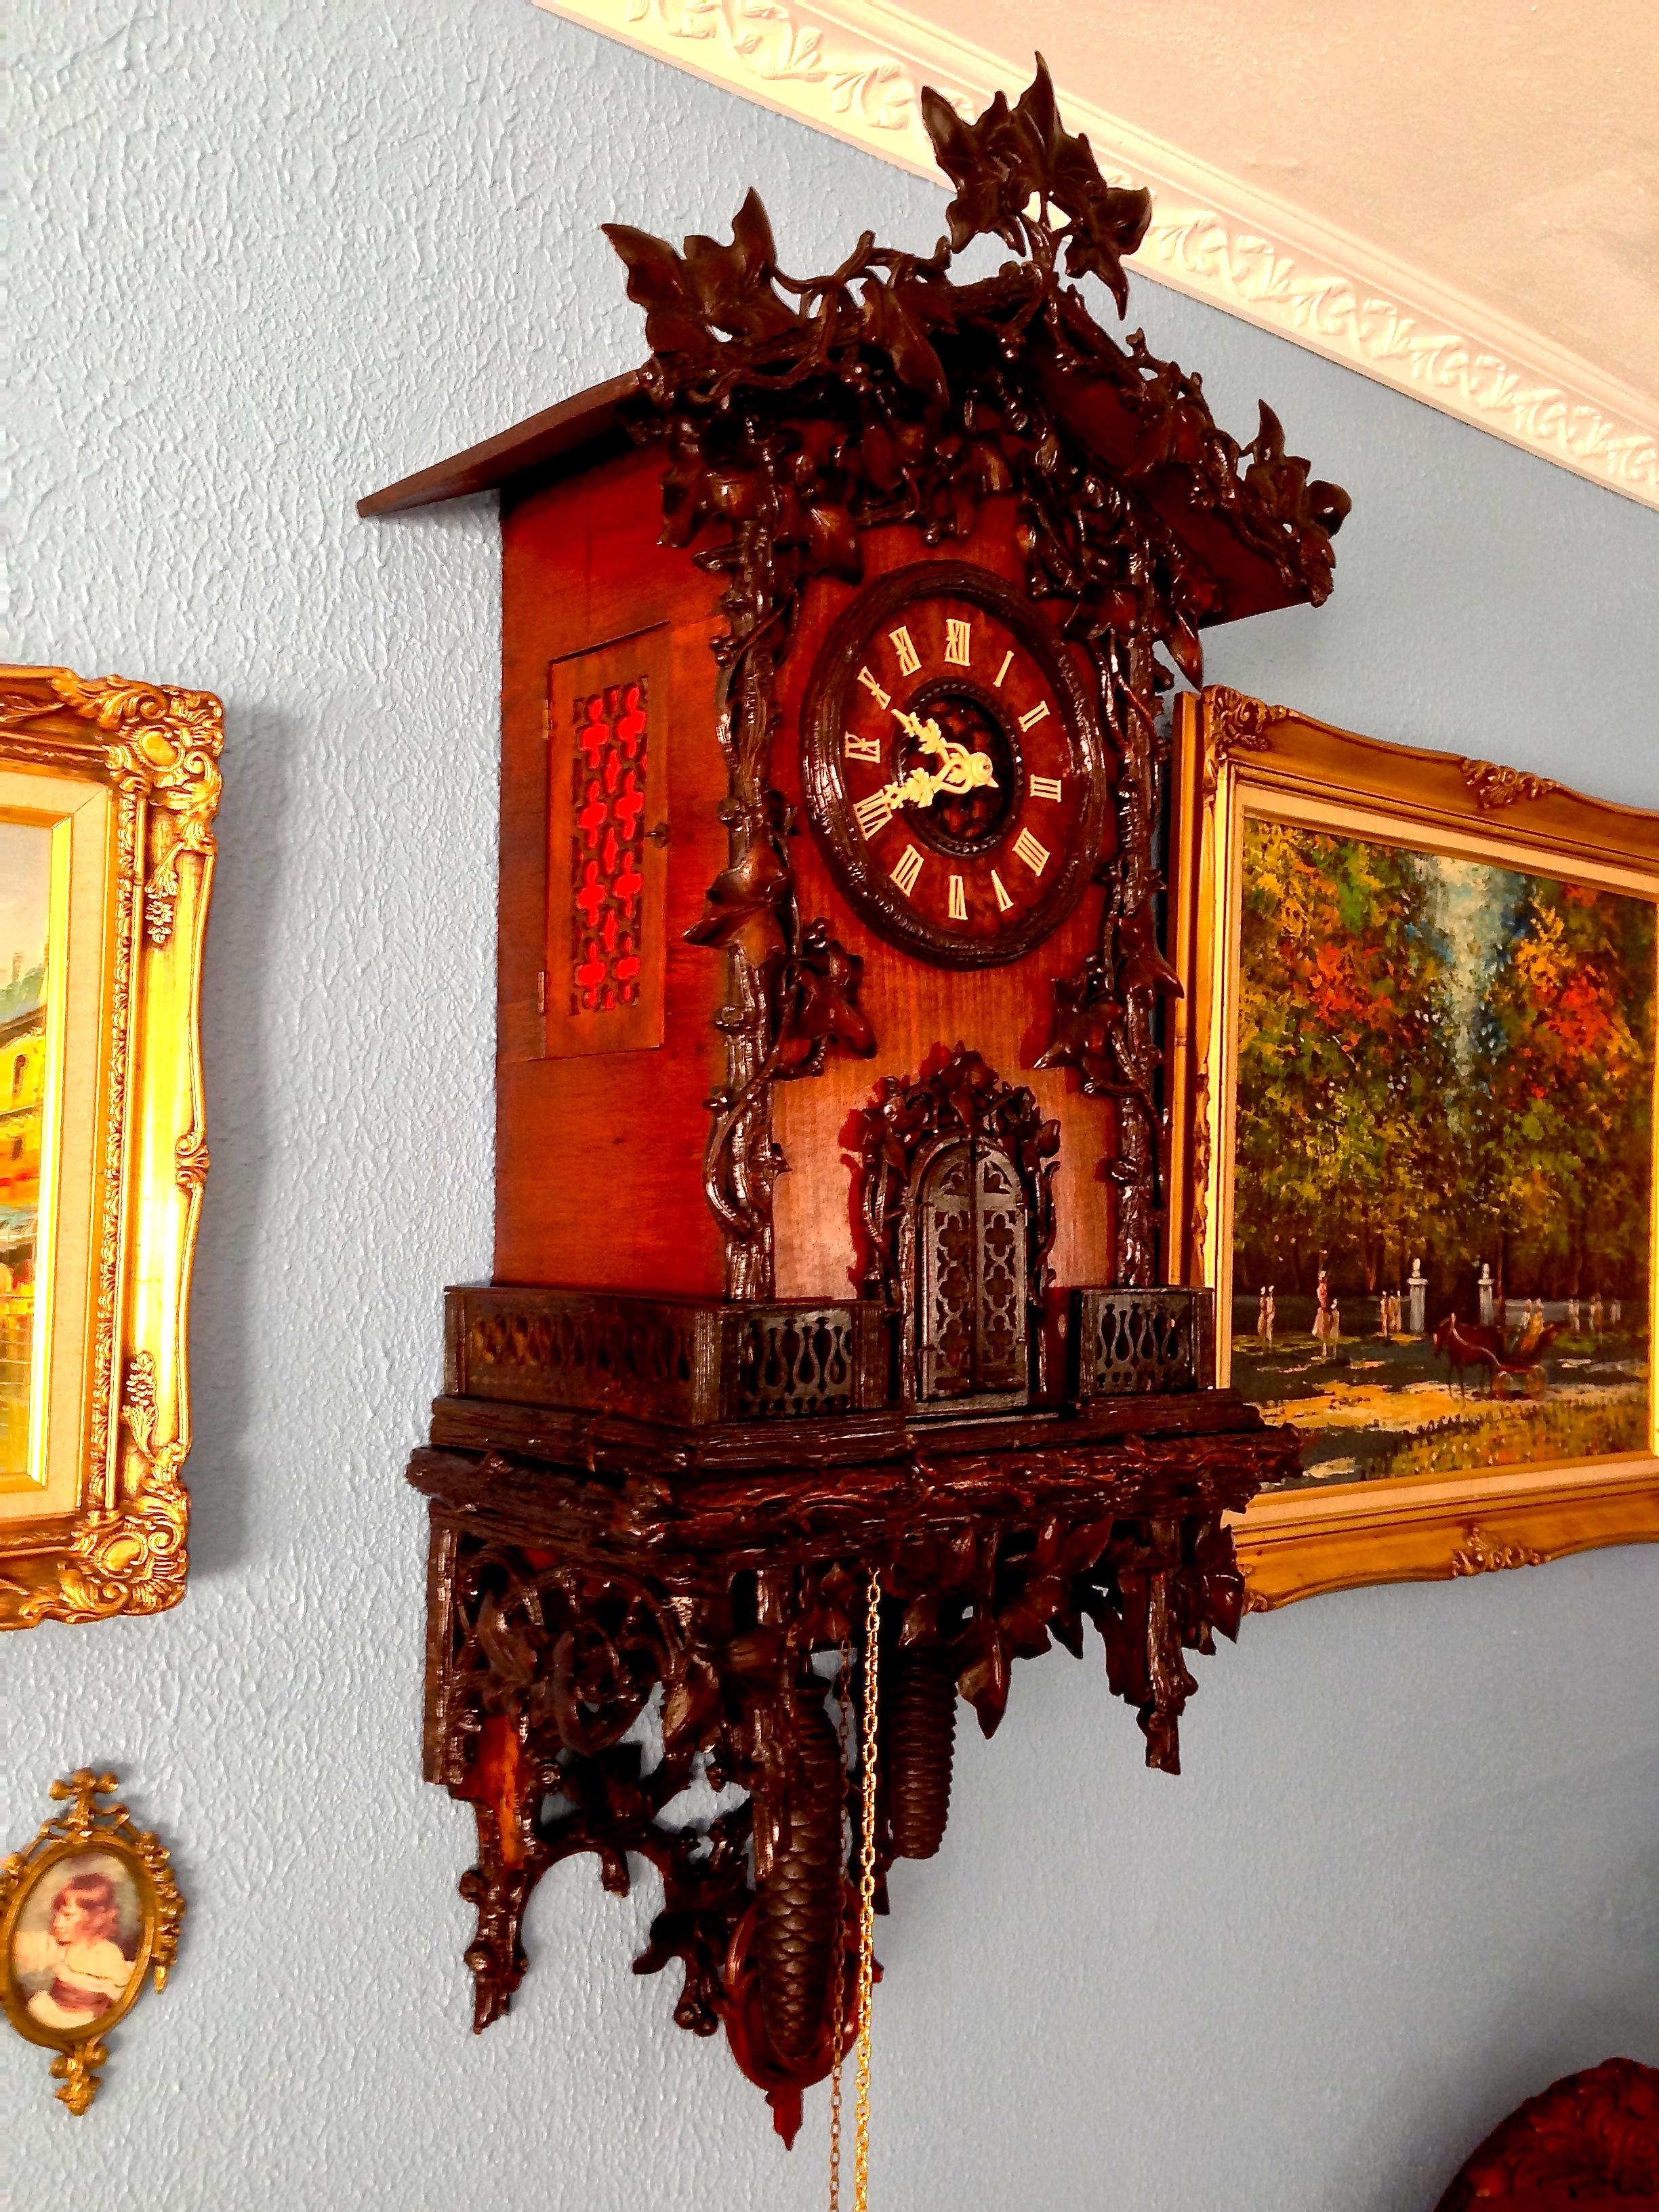 Very Early Wehrle Trumpeter Clock